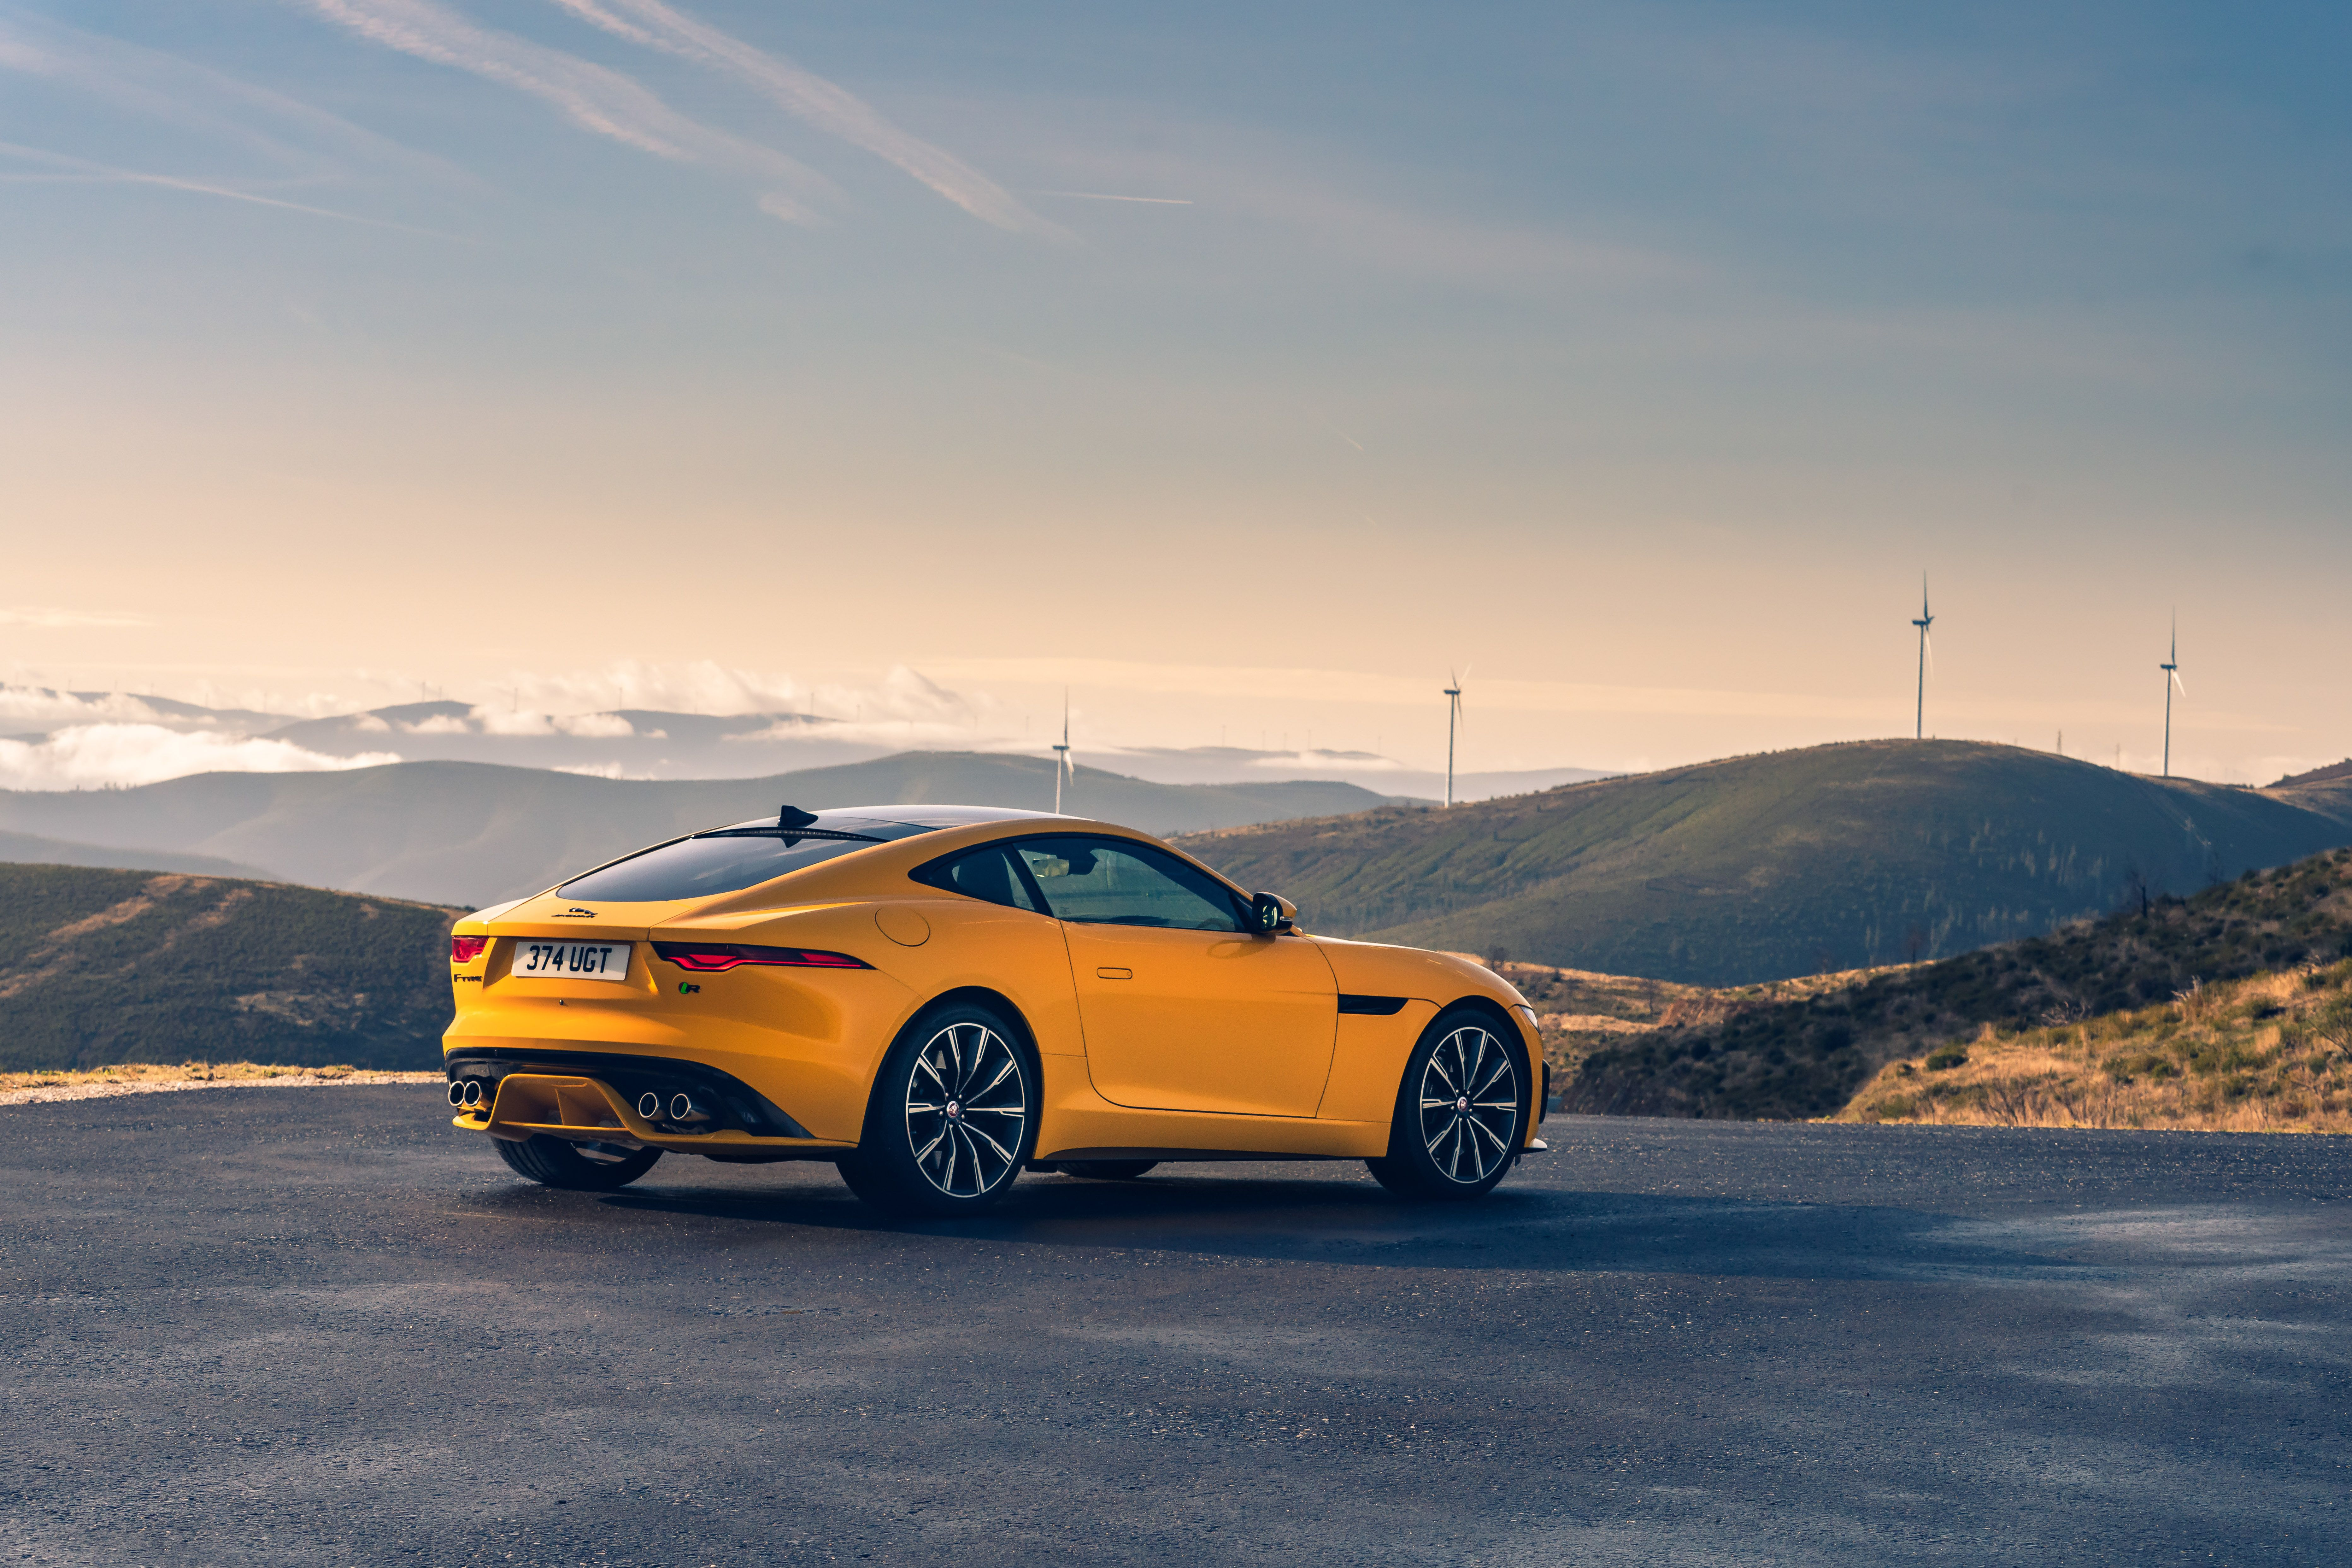 Jaguar F Type R Coupe 5k, HD Cars, 4k Wallpapers, Images ...